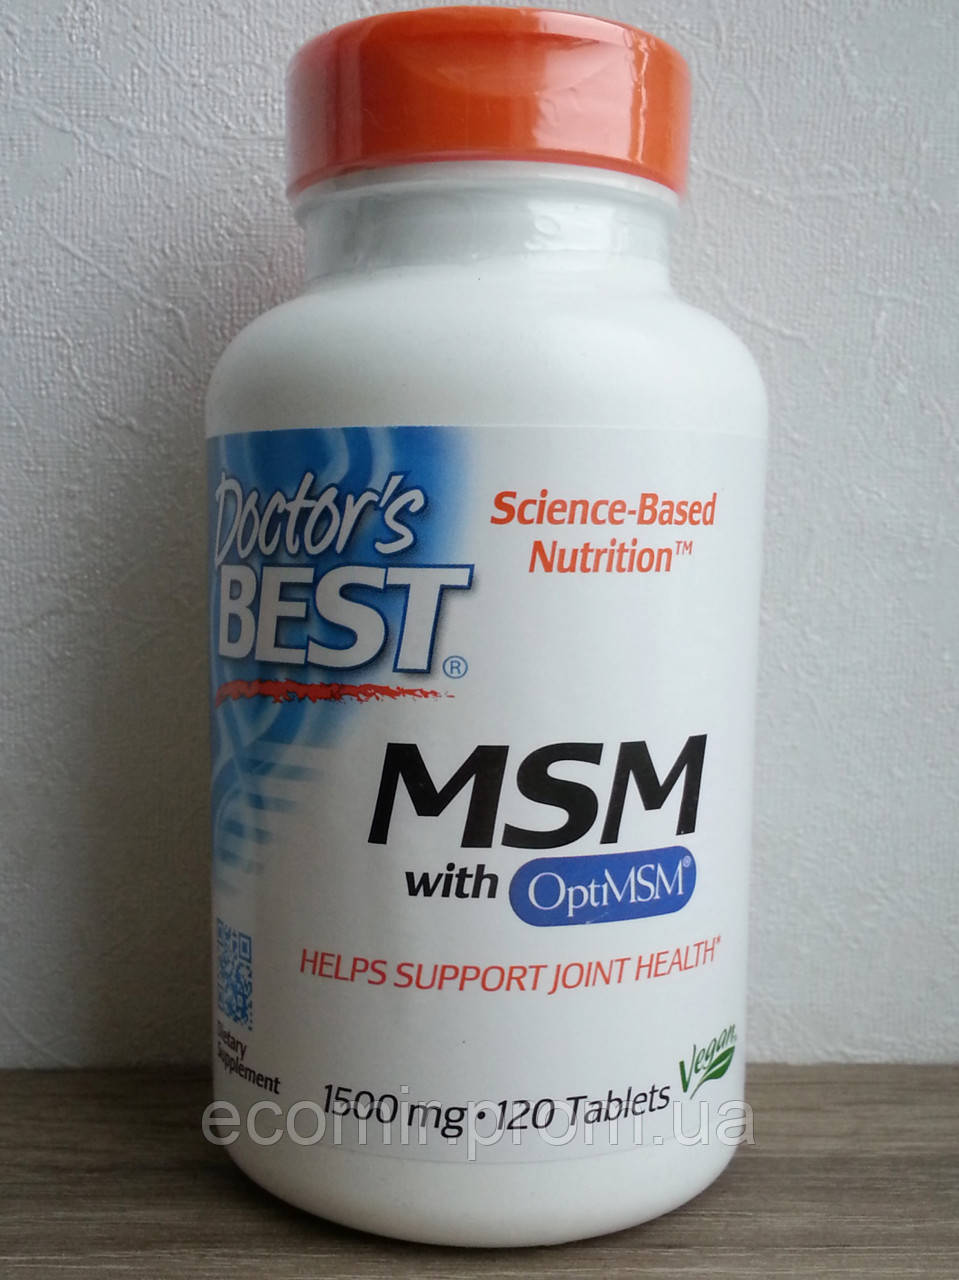 Сера (MSM with OptiMSM),Doctor's Best (1500 мг / 120 таблеток)